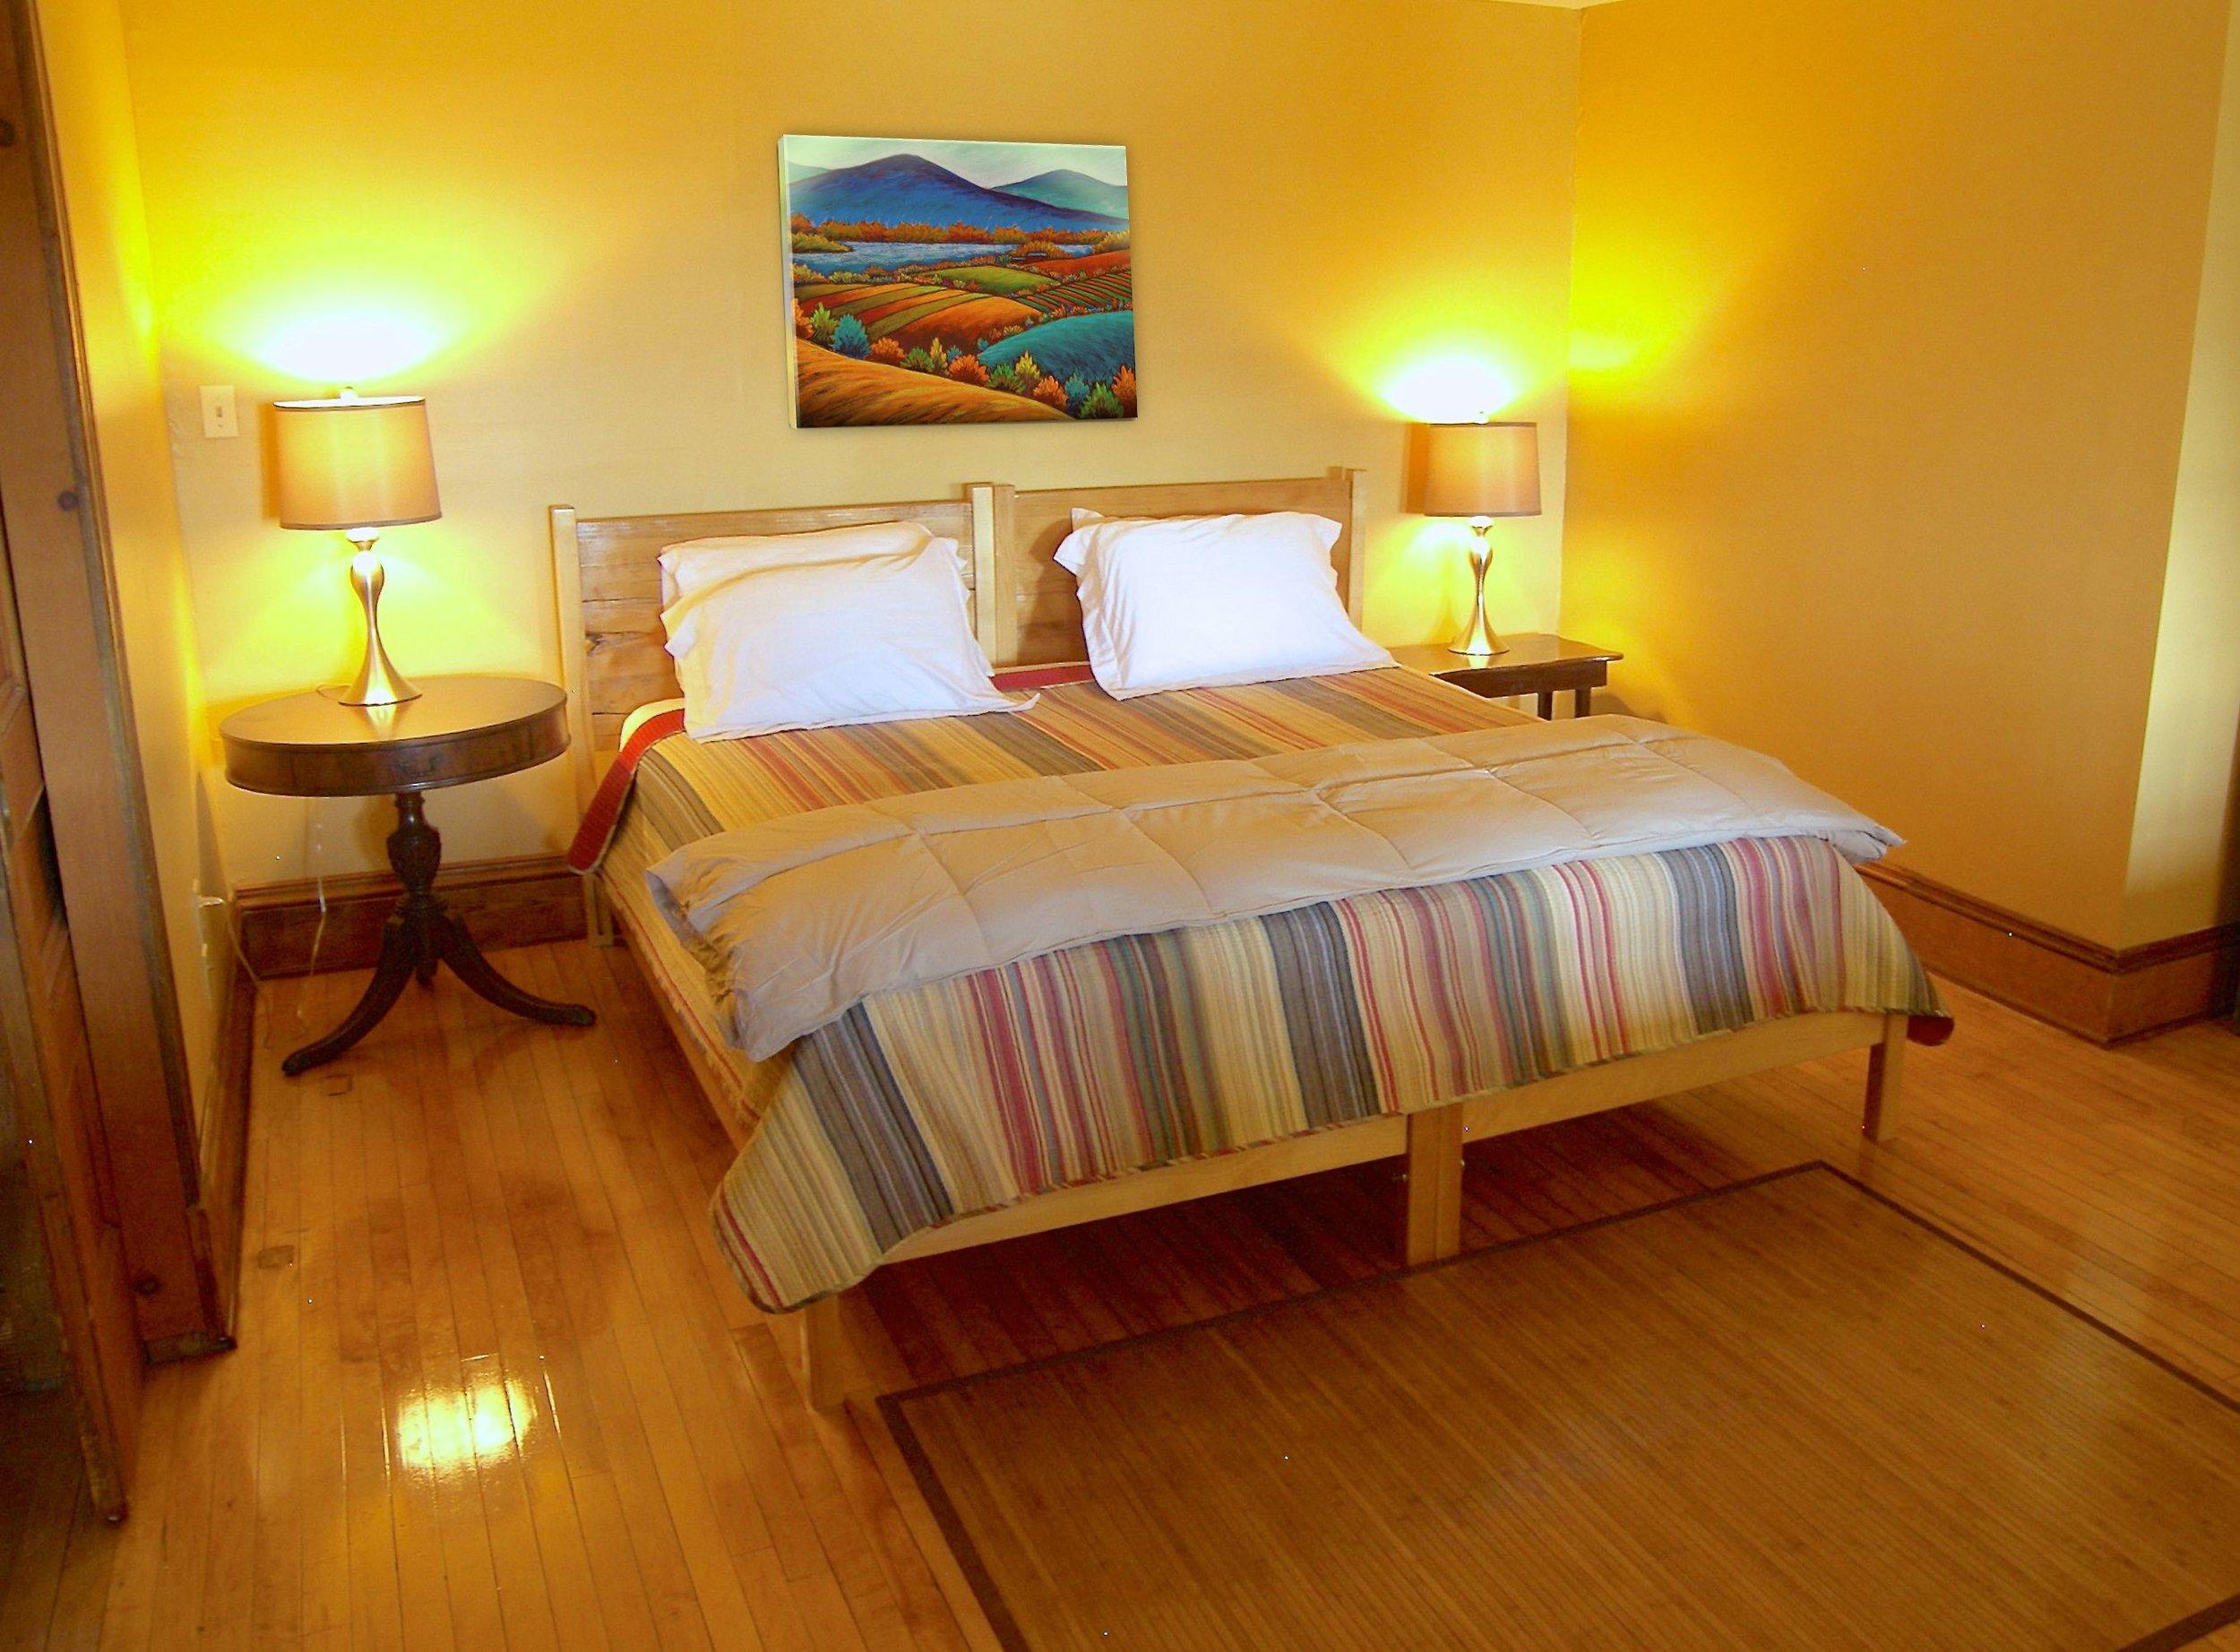 Handmade beds, original hardwood floors and decorative hardware, Vermont artists